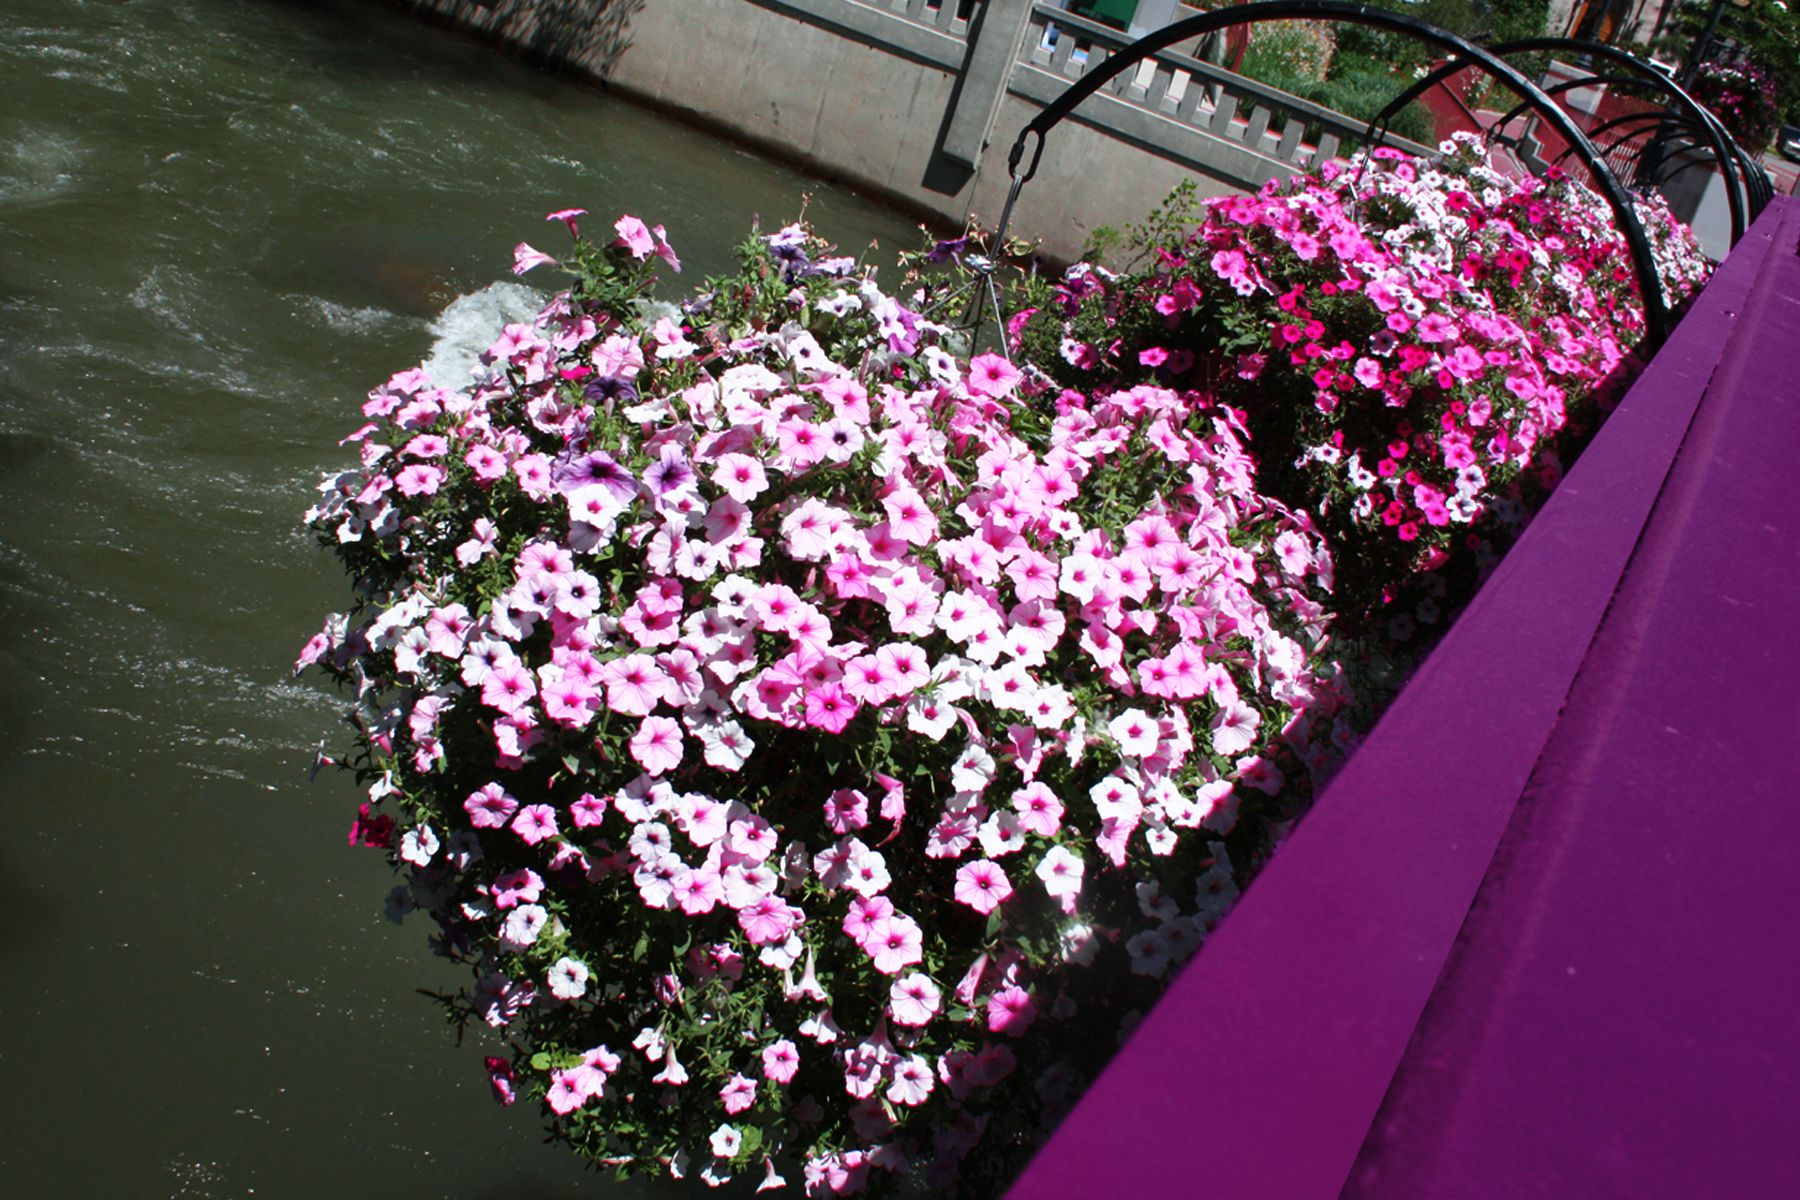 Downtown reno flower baskets via paul klein flower